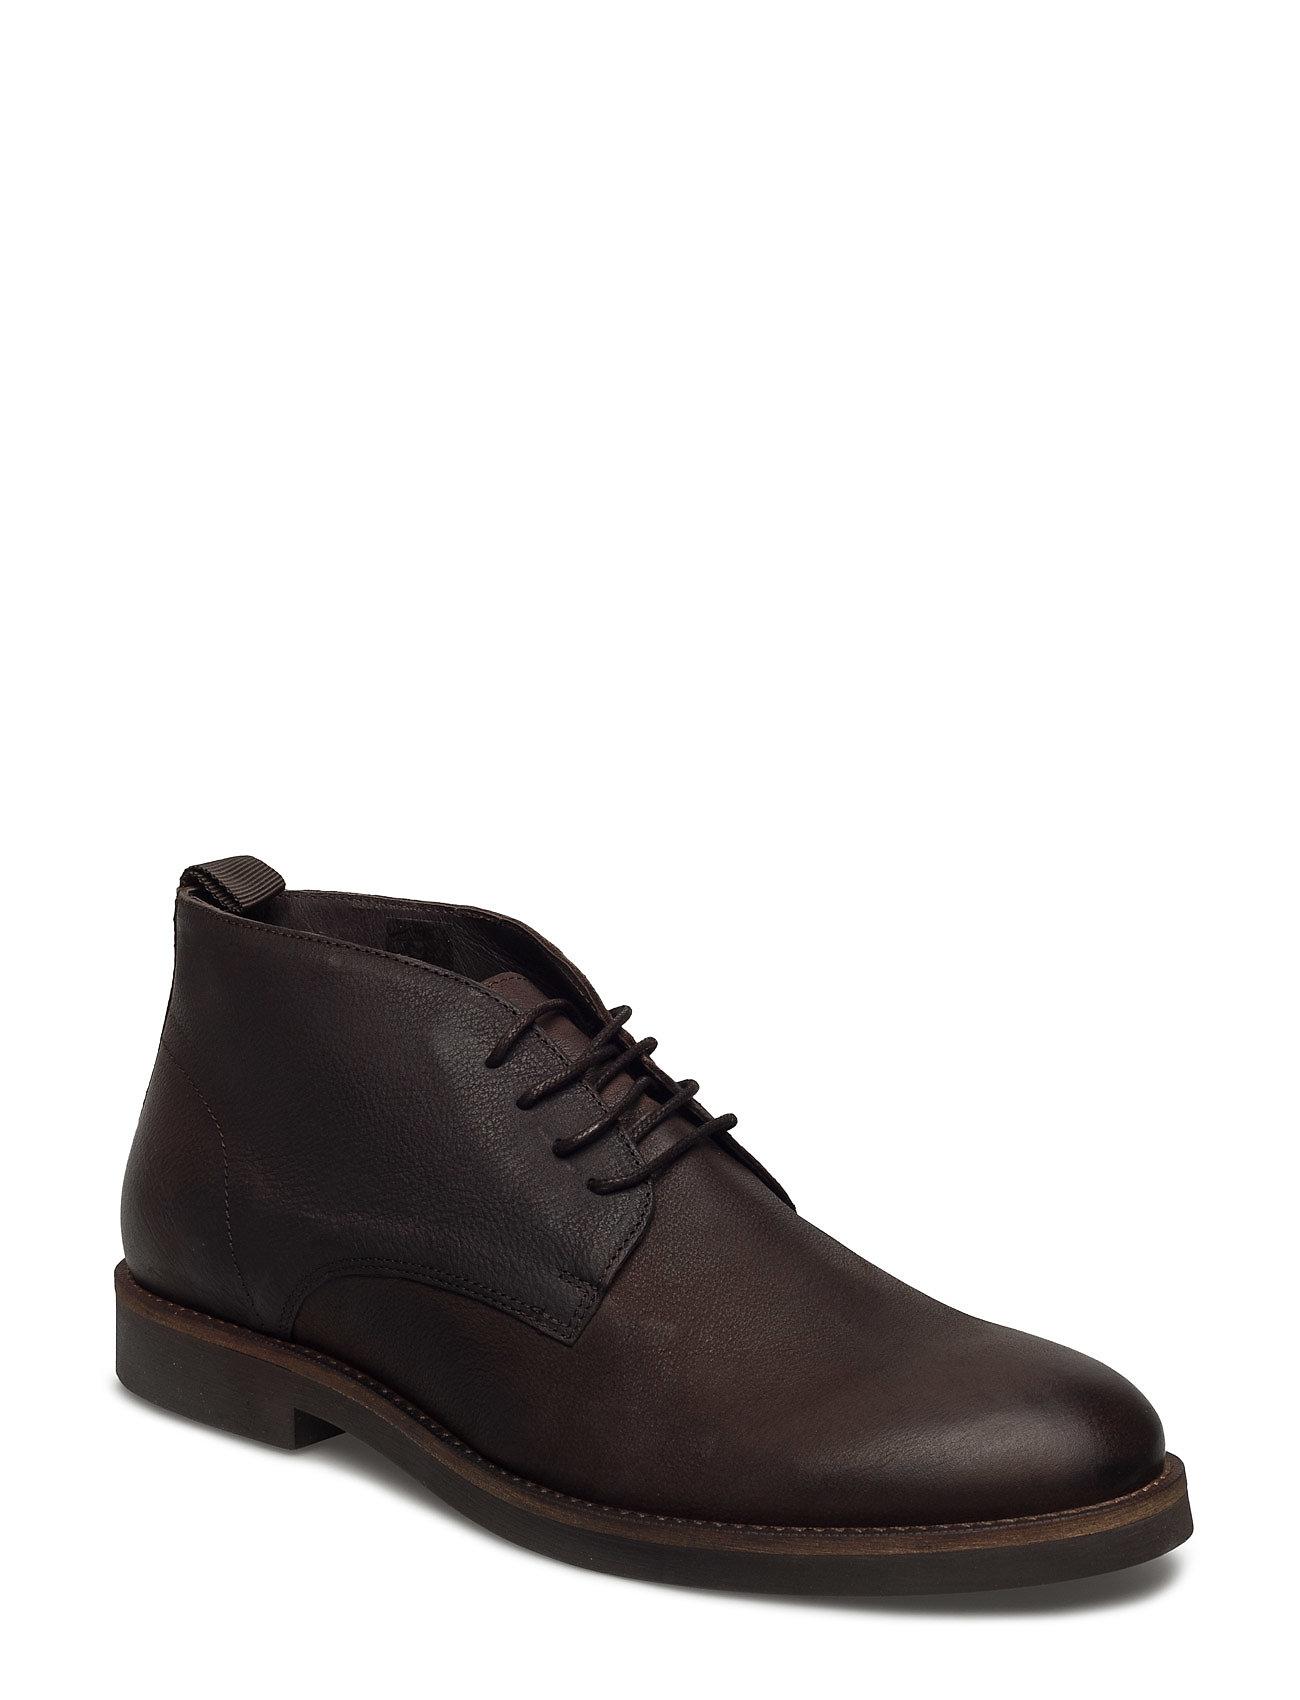 Carwin Matinique Støvler til Herrer i cognac